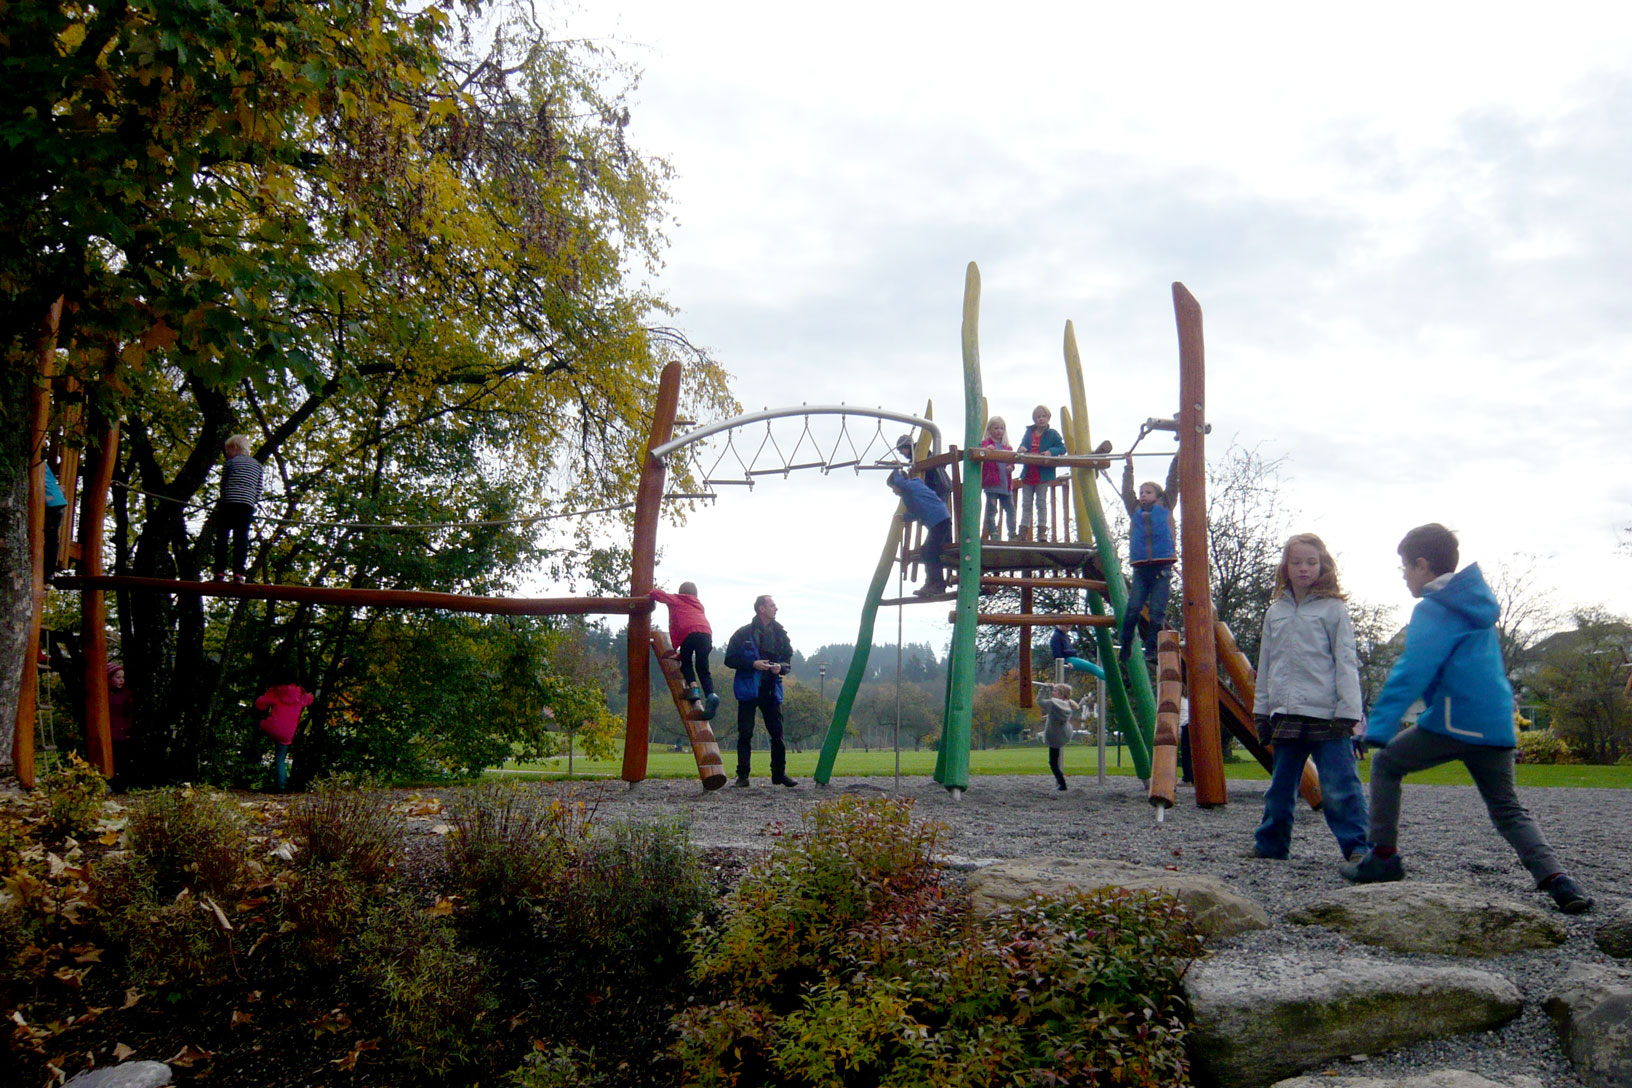 Pausenhof Grundschule Grünkraut, Klettergerüst